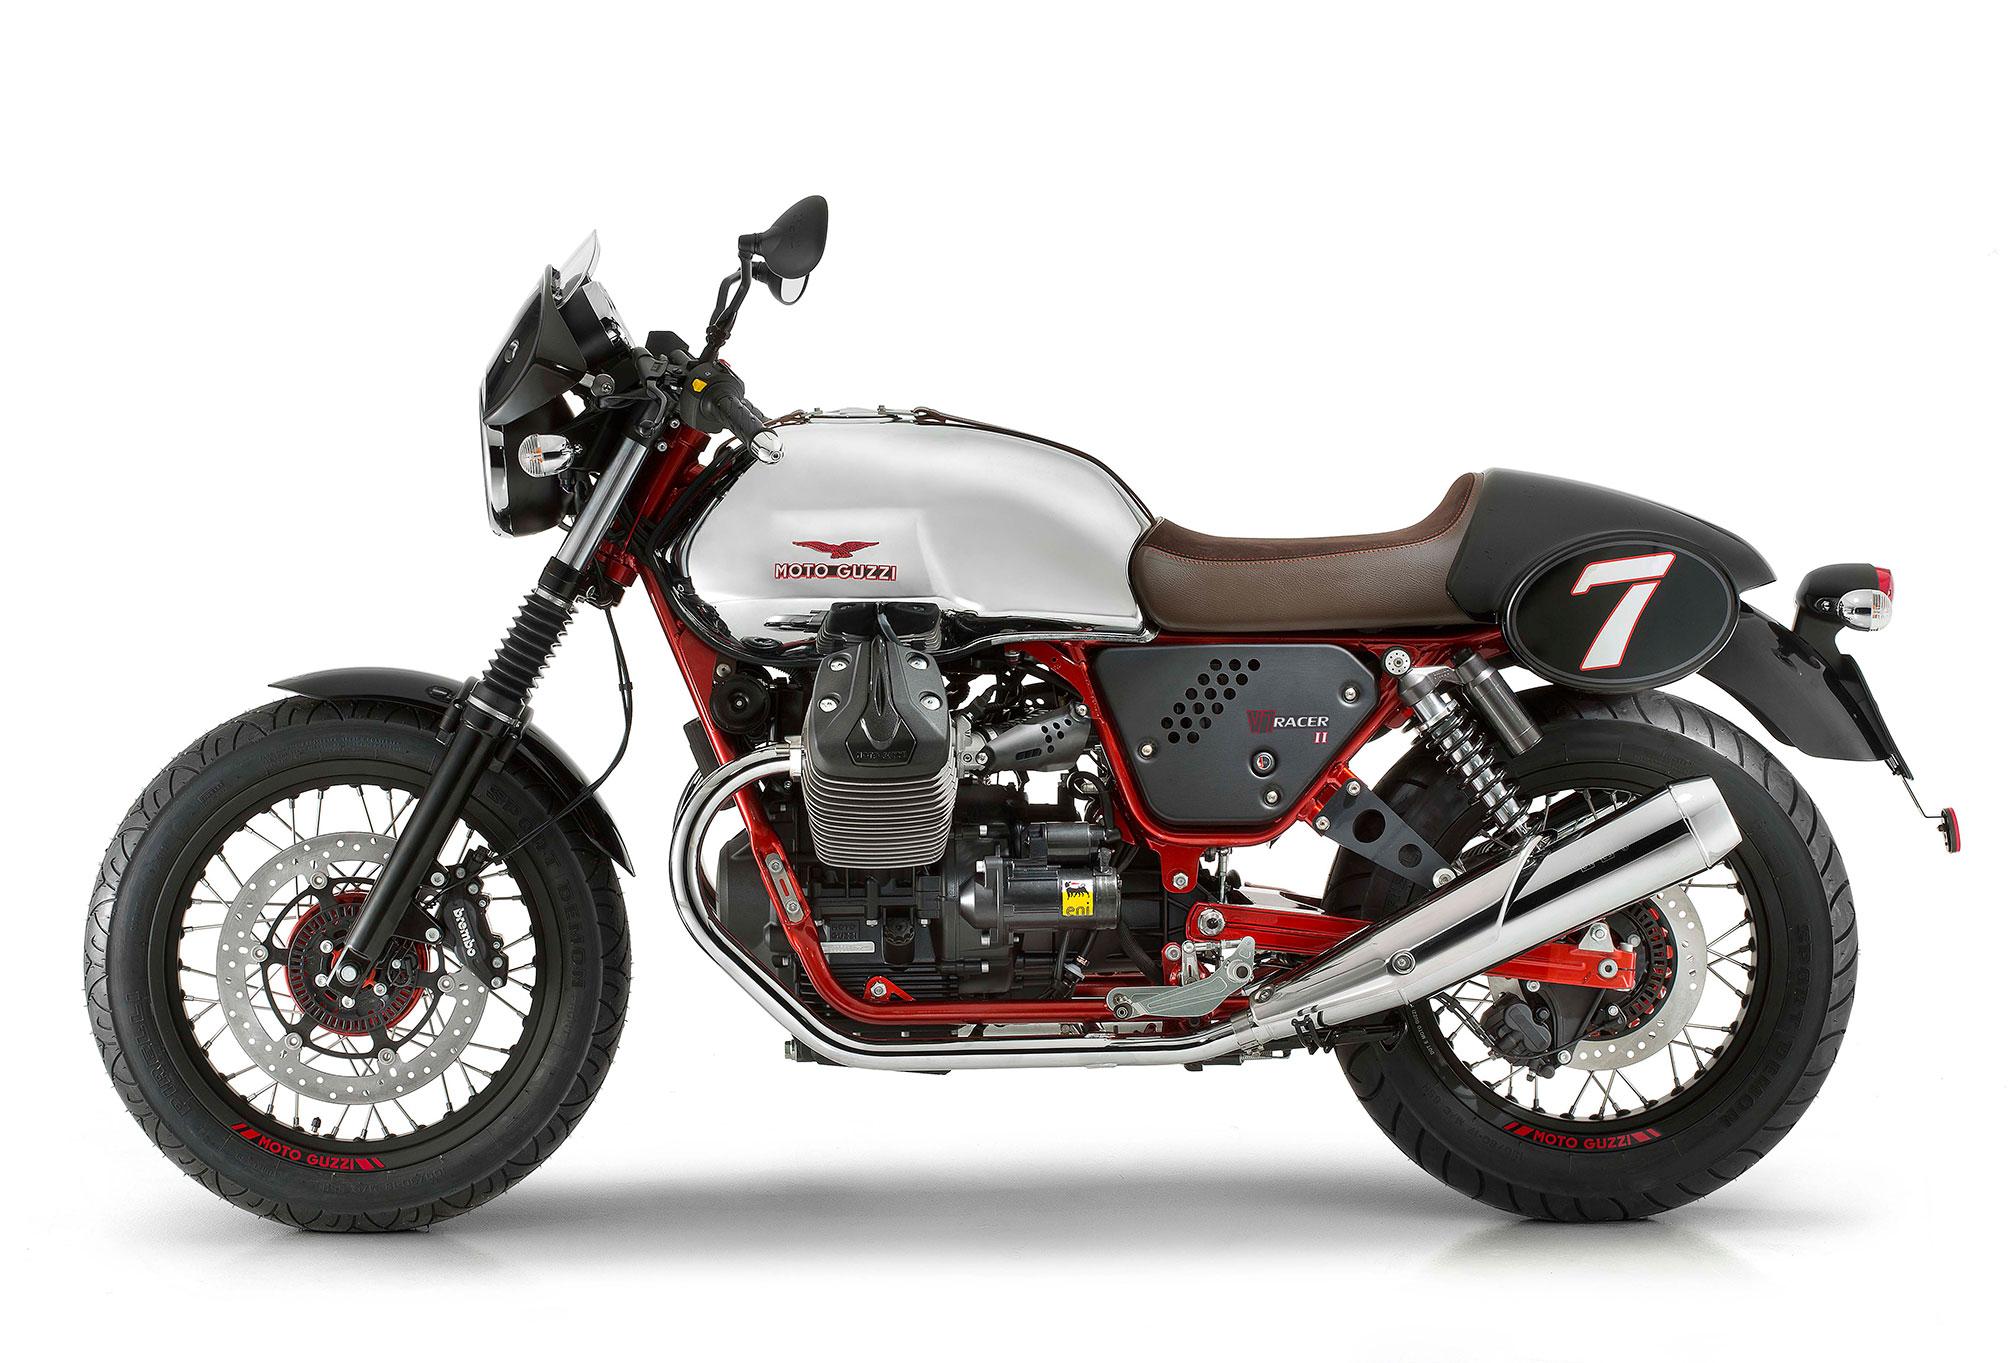 moto guzzi v7 ii racer specs 2014 2015 autoevolution. Black Bedroom Furniture Sets. Home Design Ideas